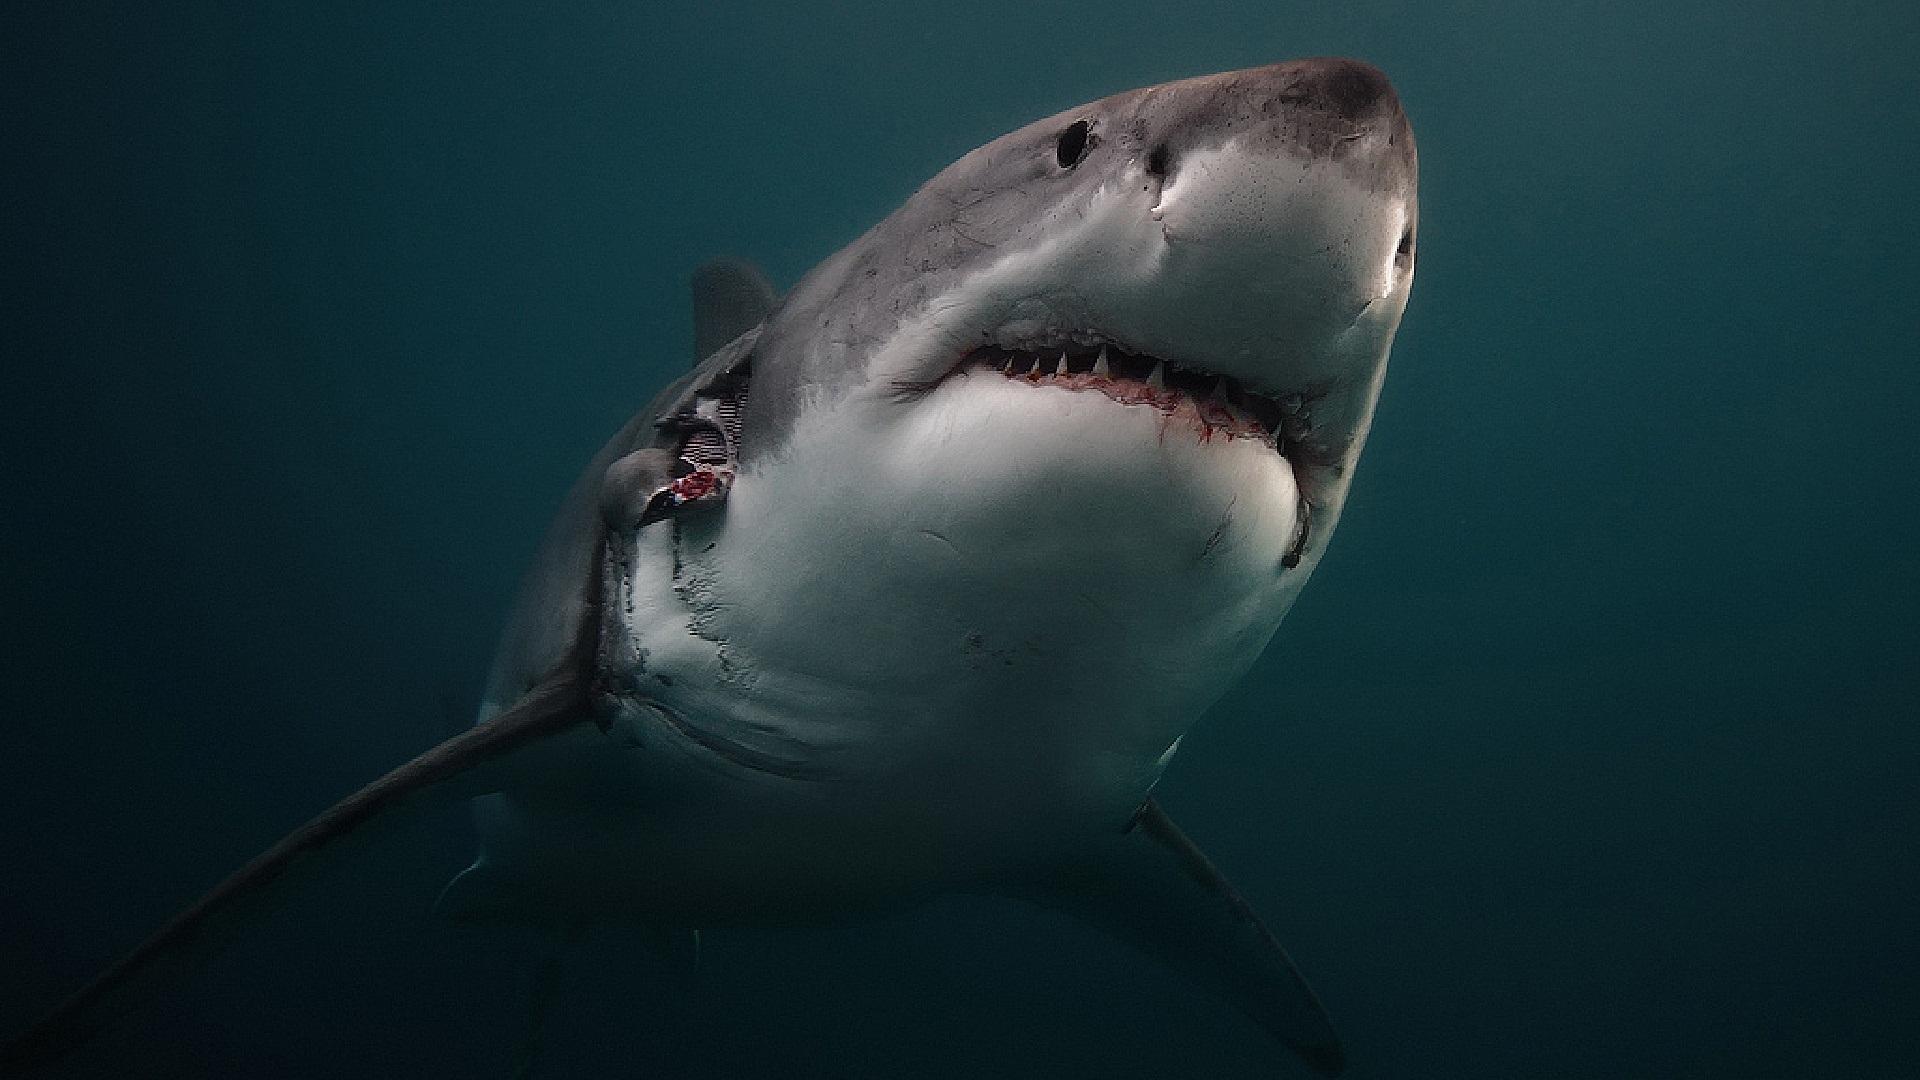 Wallpaper Shark Predator Underwater 1920x1080